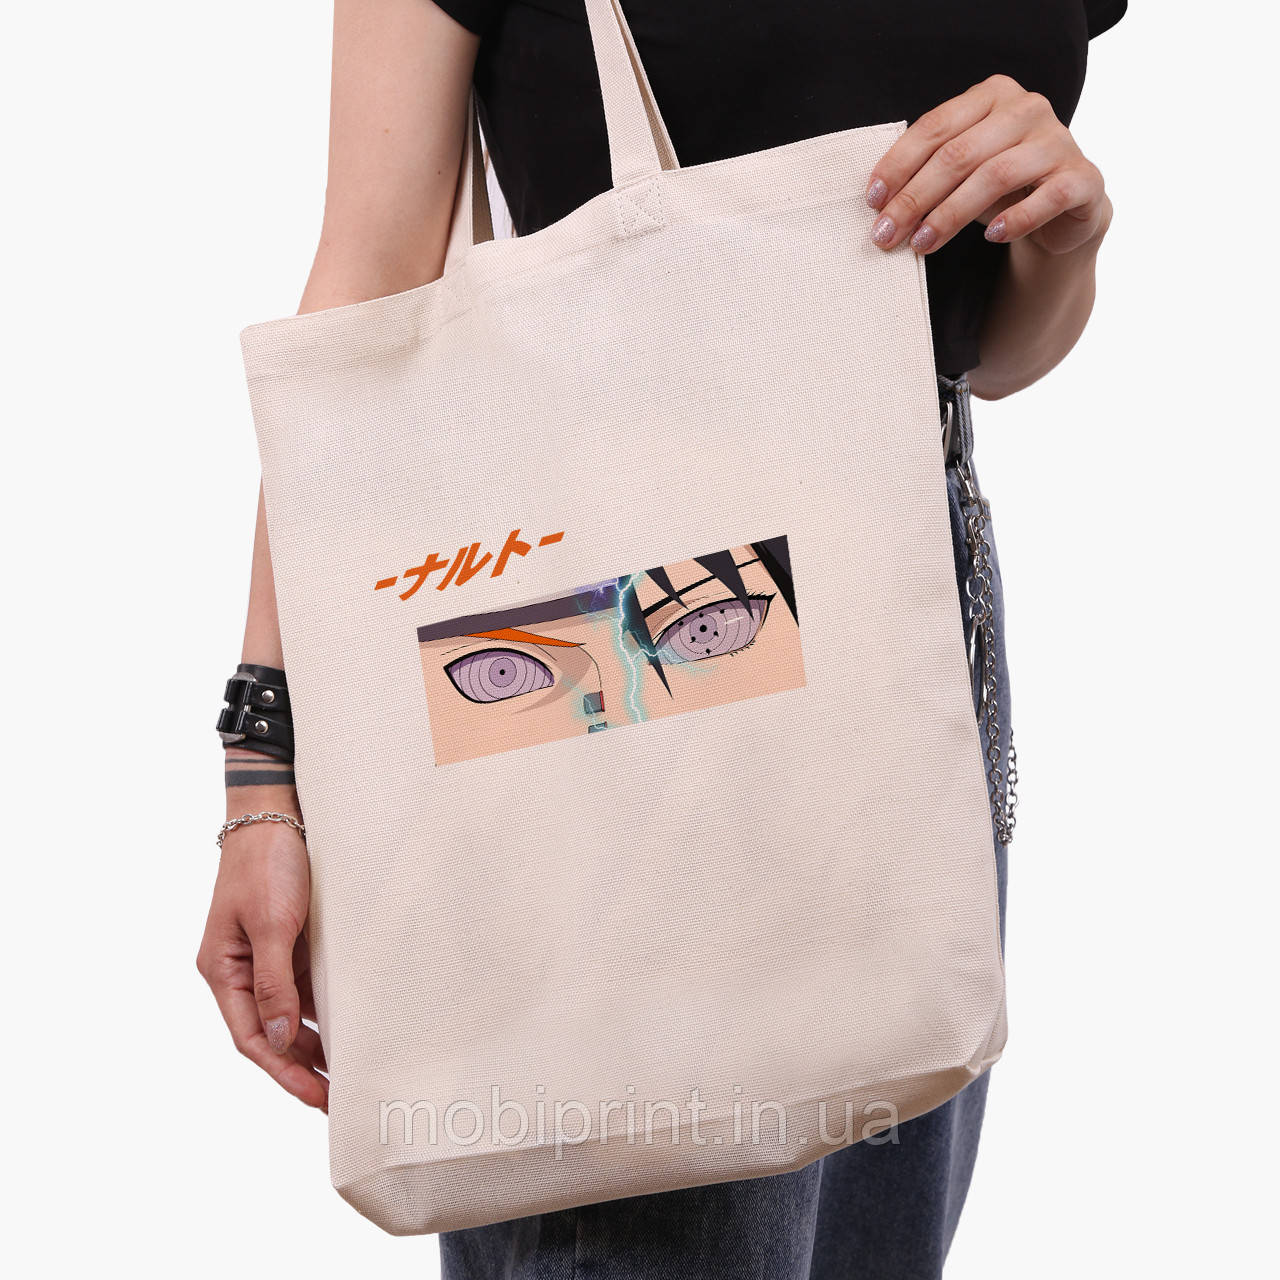 Эко сумка шоппер белая Наруто Узумаки и Саске Учиха (Naruto Uzumaki and Sasuke Uchiha) (9227-2819-1)  41*39*8